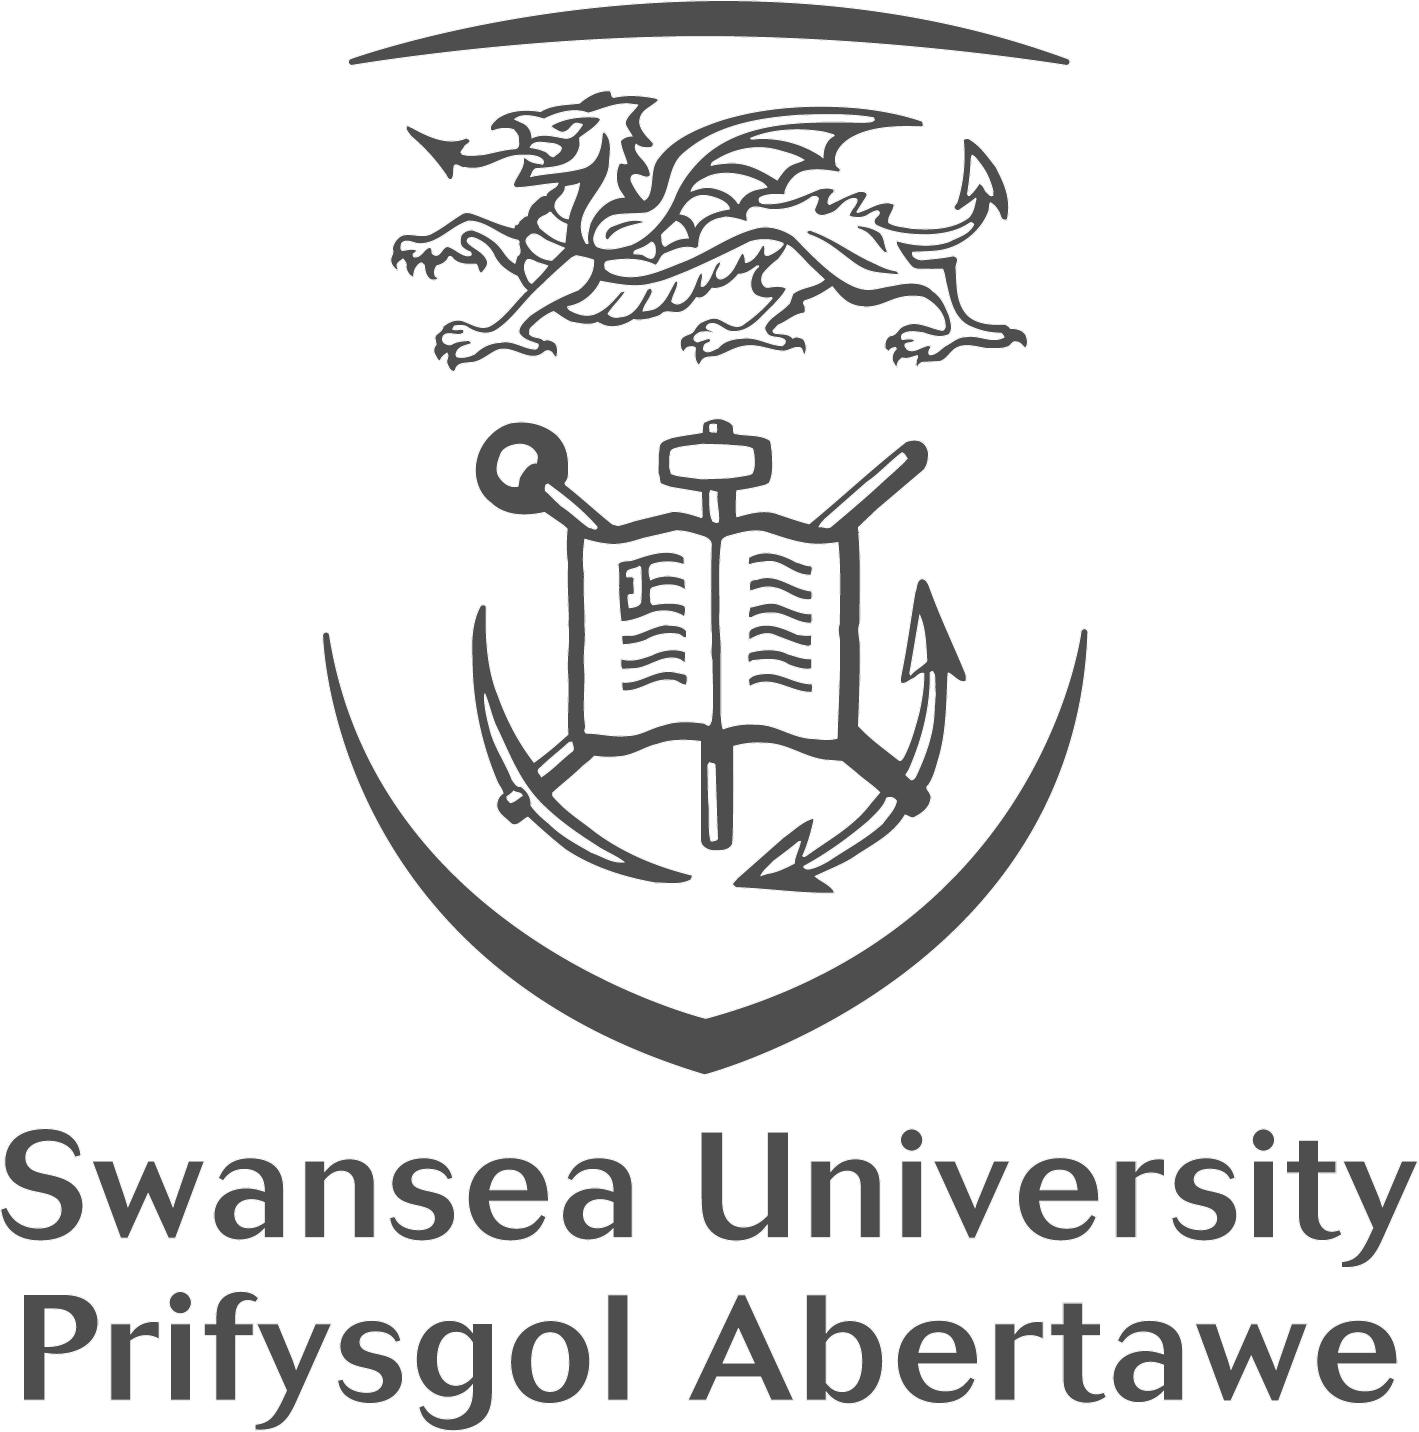 SwanseaUniversity1